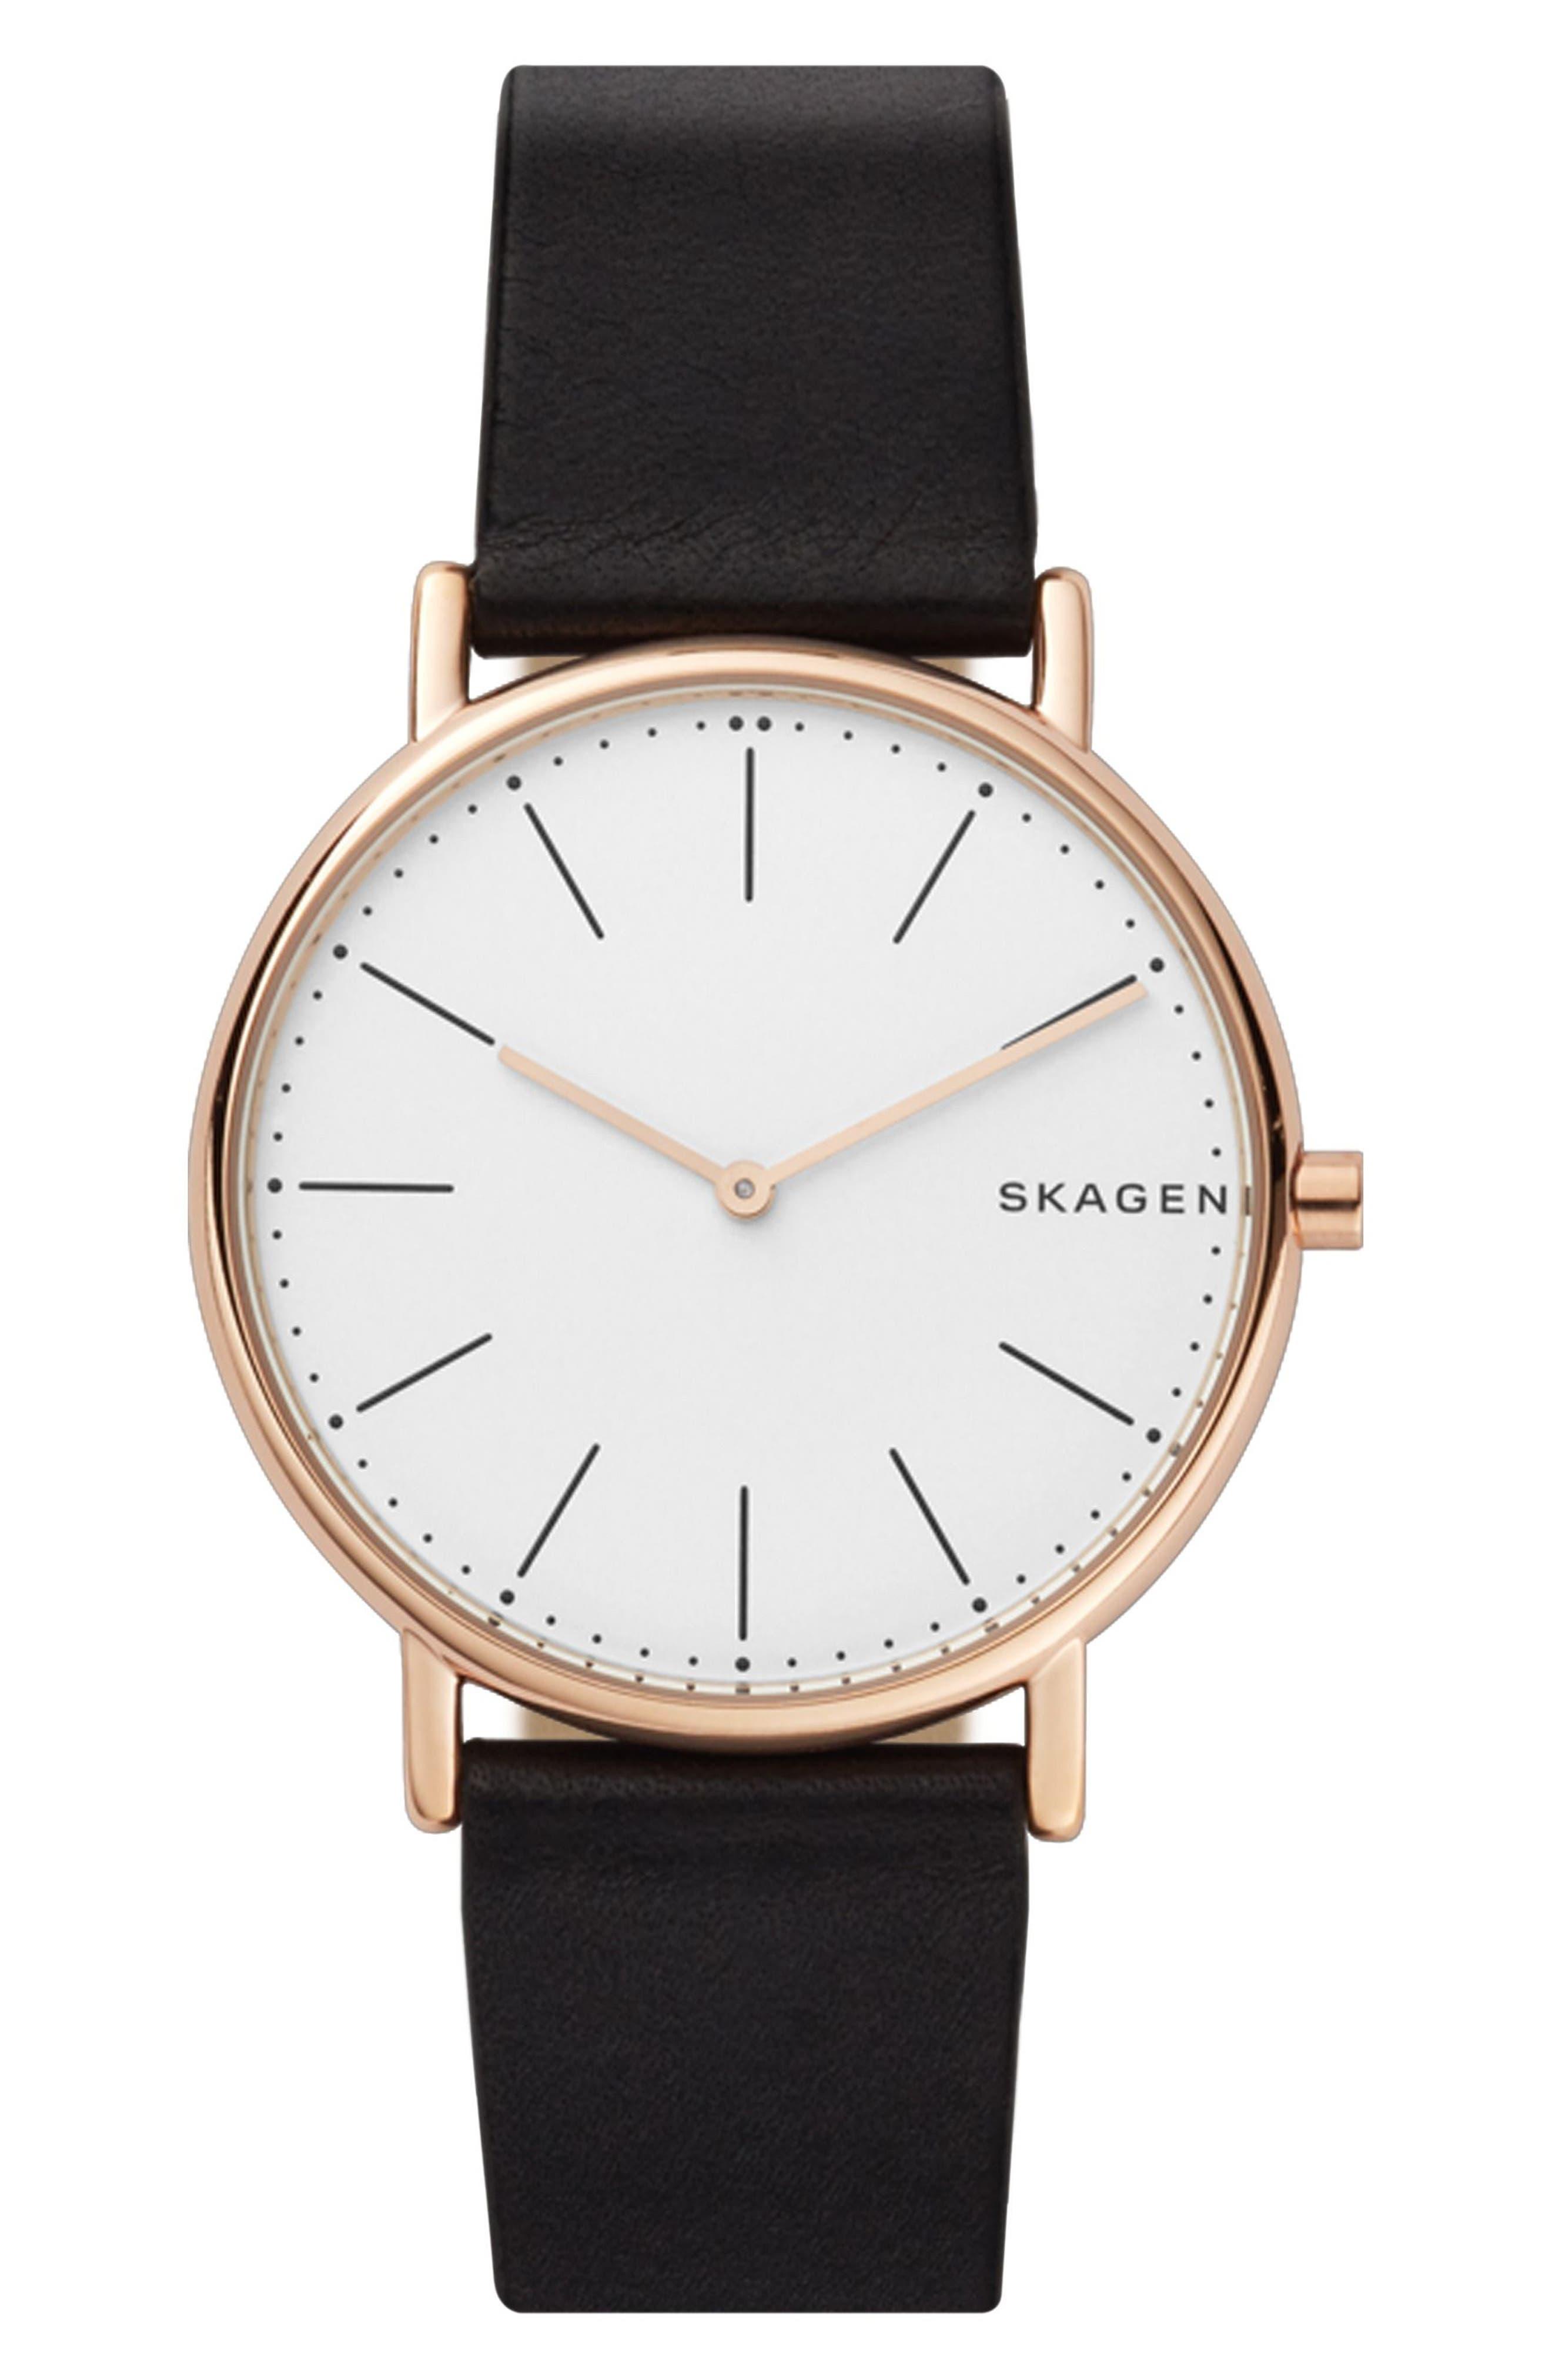 Main Image - Skagen Signatur Slim Leather Strap Watch, 40mm